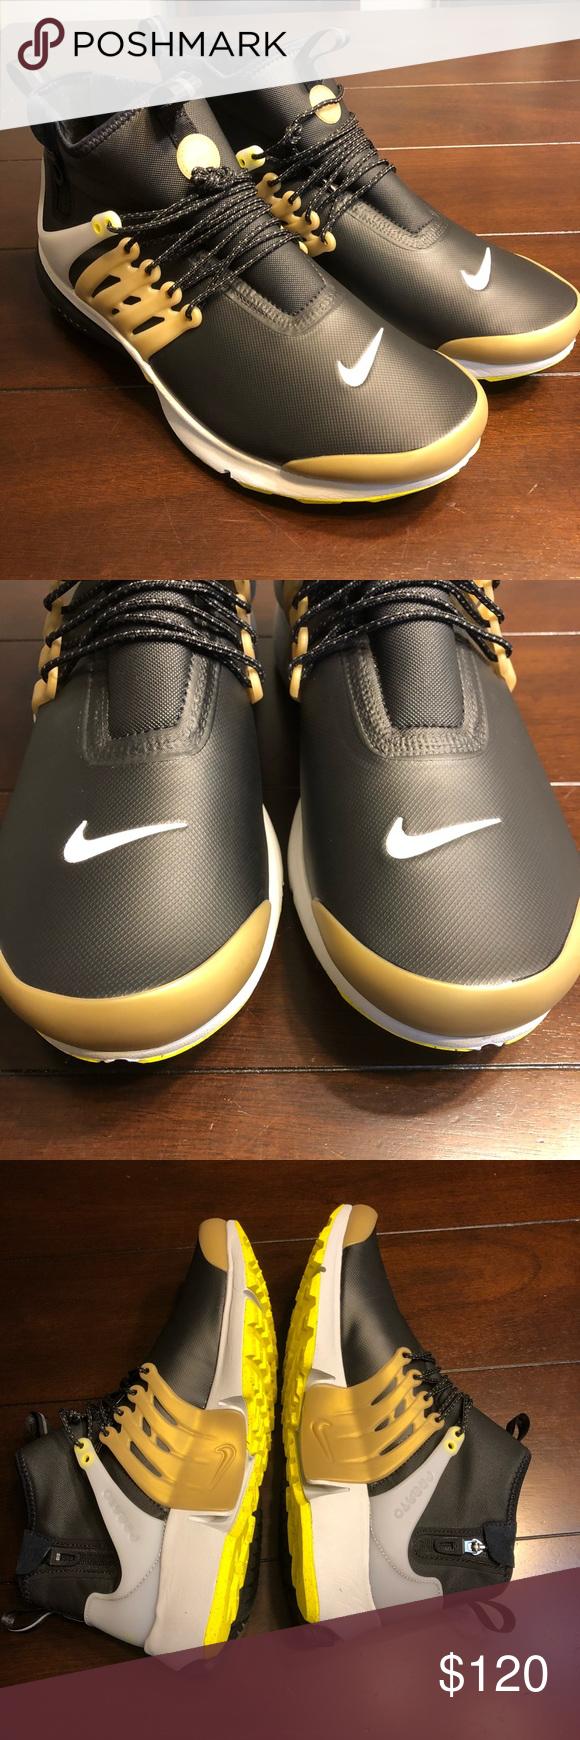 official photos 6dd0f daf92 Mens Nike Air Presto Utility Mid Sz 12 859524-002 NEW Mens Nike Air Presto  Utility Mid Sz 12 859524-002 Sneaker Boot Winter Black No box Nike Shoes  Sneakers